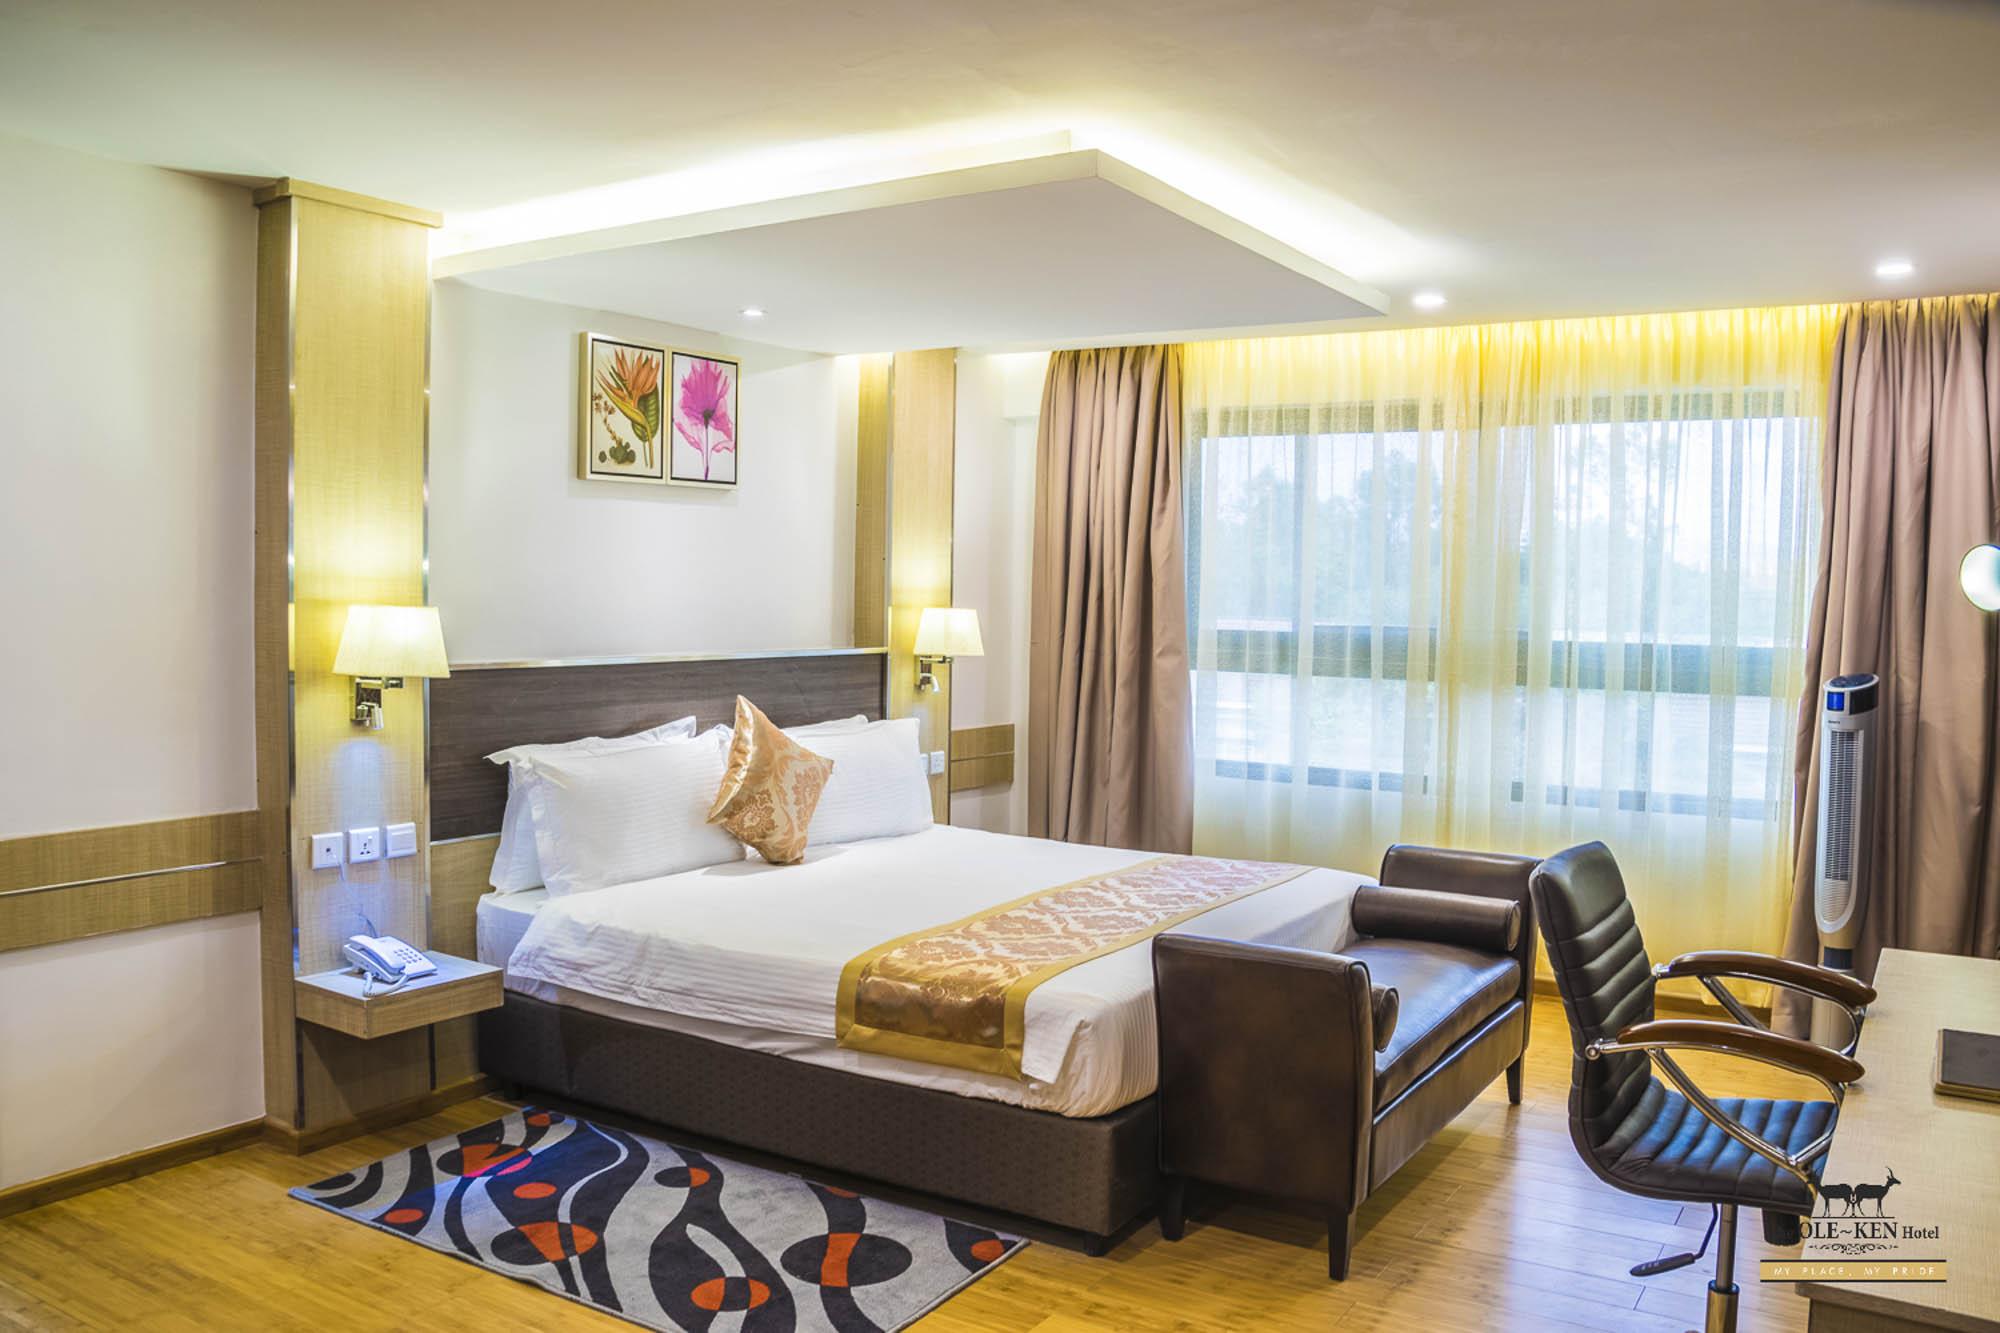 Accommodation Types 1